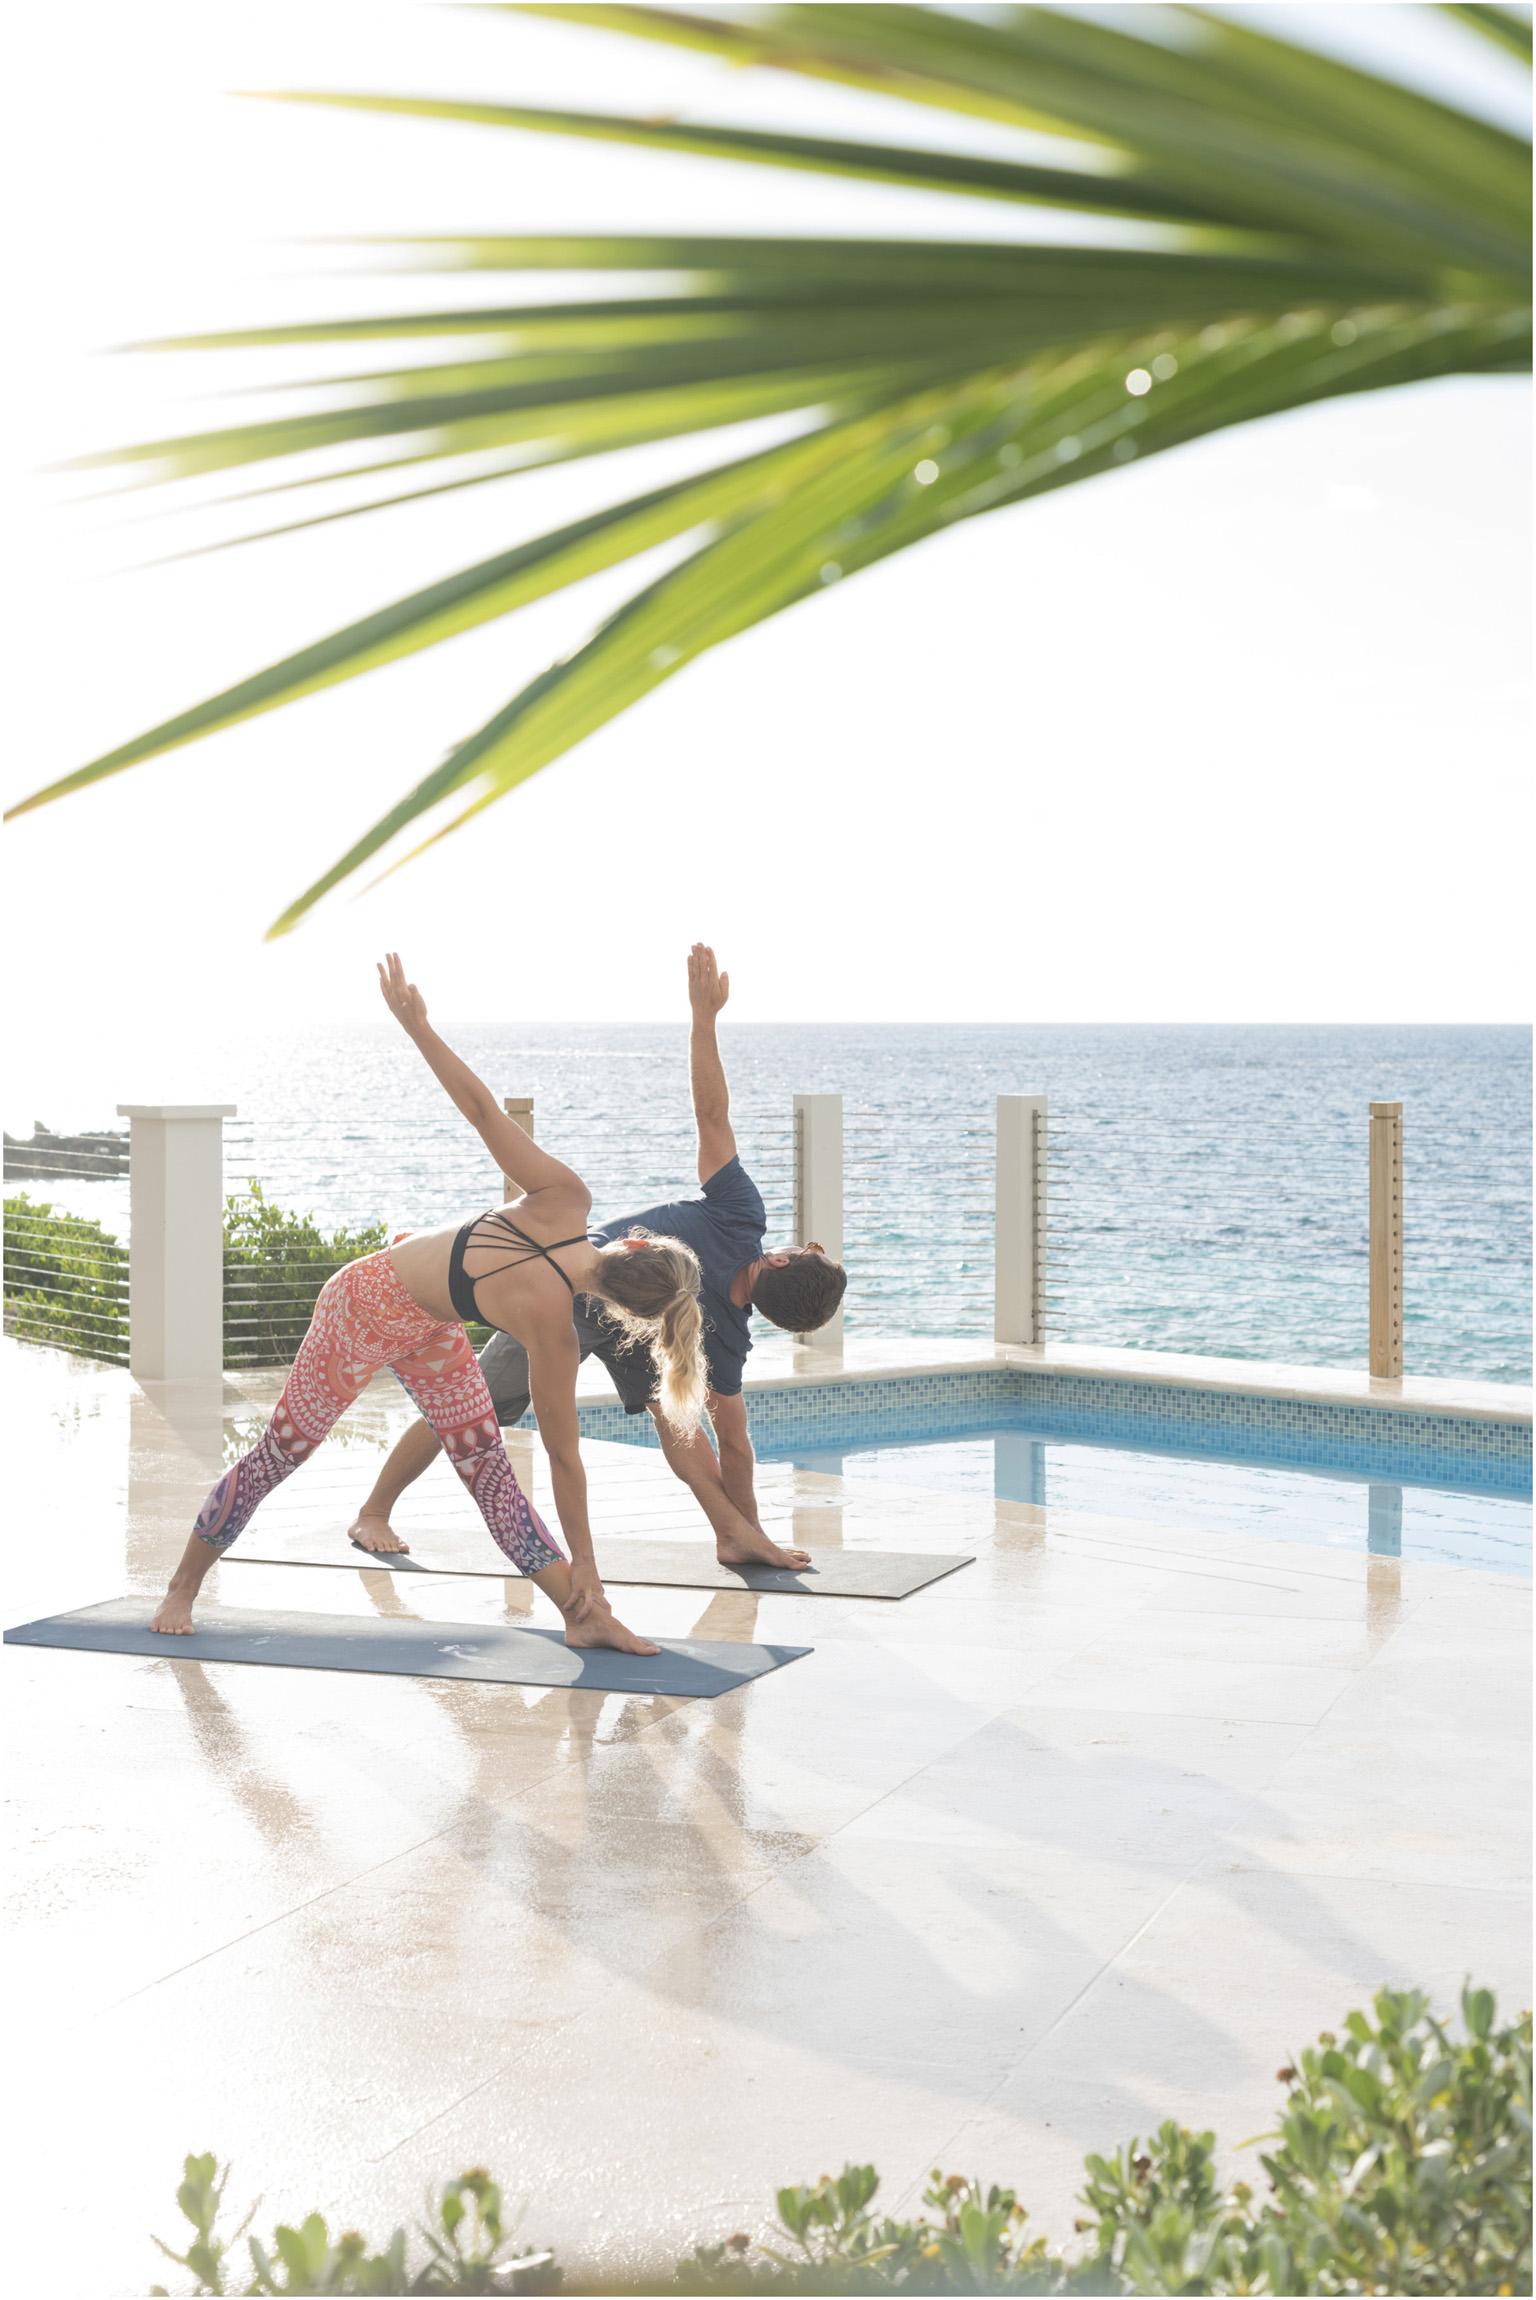 ©FianderFoto_Winnow_Poolside Yoga_007.jpg